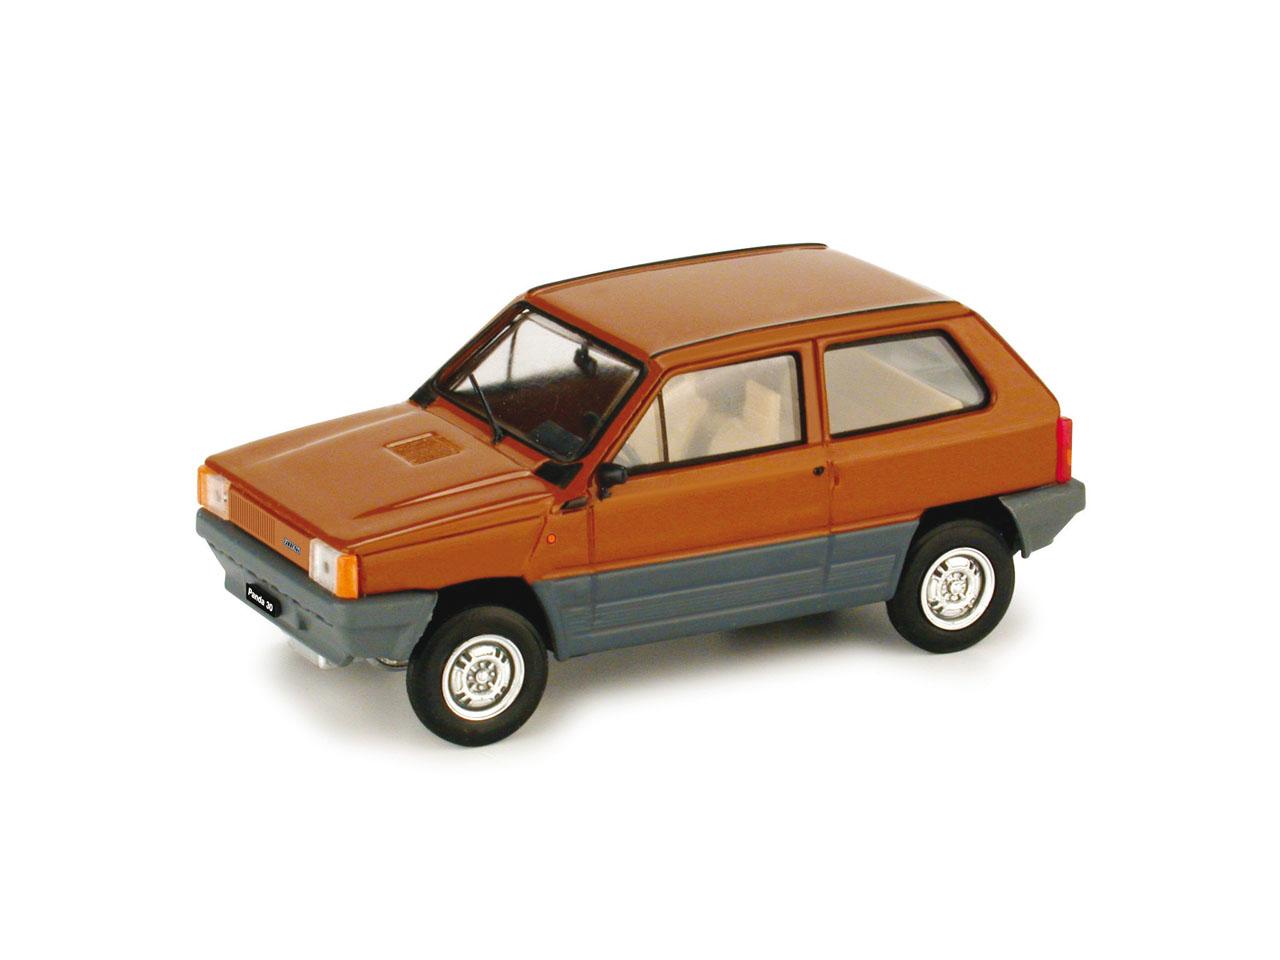 Fiat Panda 30 (1980) Brumm 1/43 Marrón Land